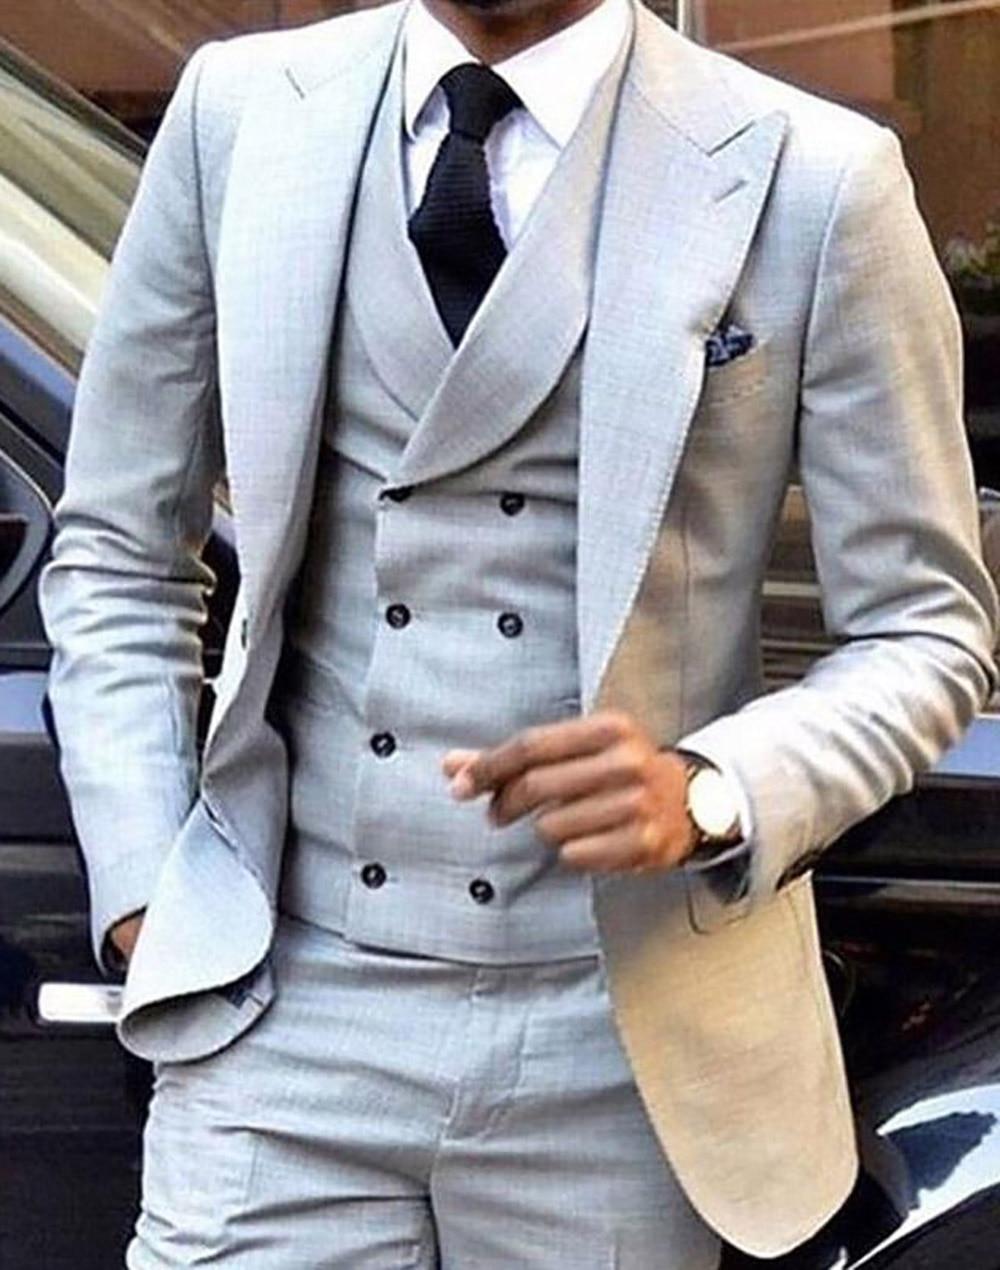 Mens Suit 3 Pieces Burgundy Double-breasted Vest Formal Business Slim Fit Notch Lape Tuxedos For Wedding Blazer+Vest+Pant 2020